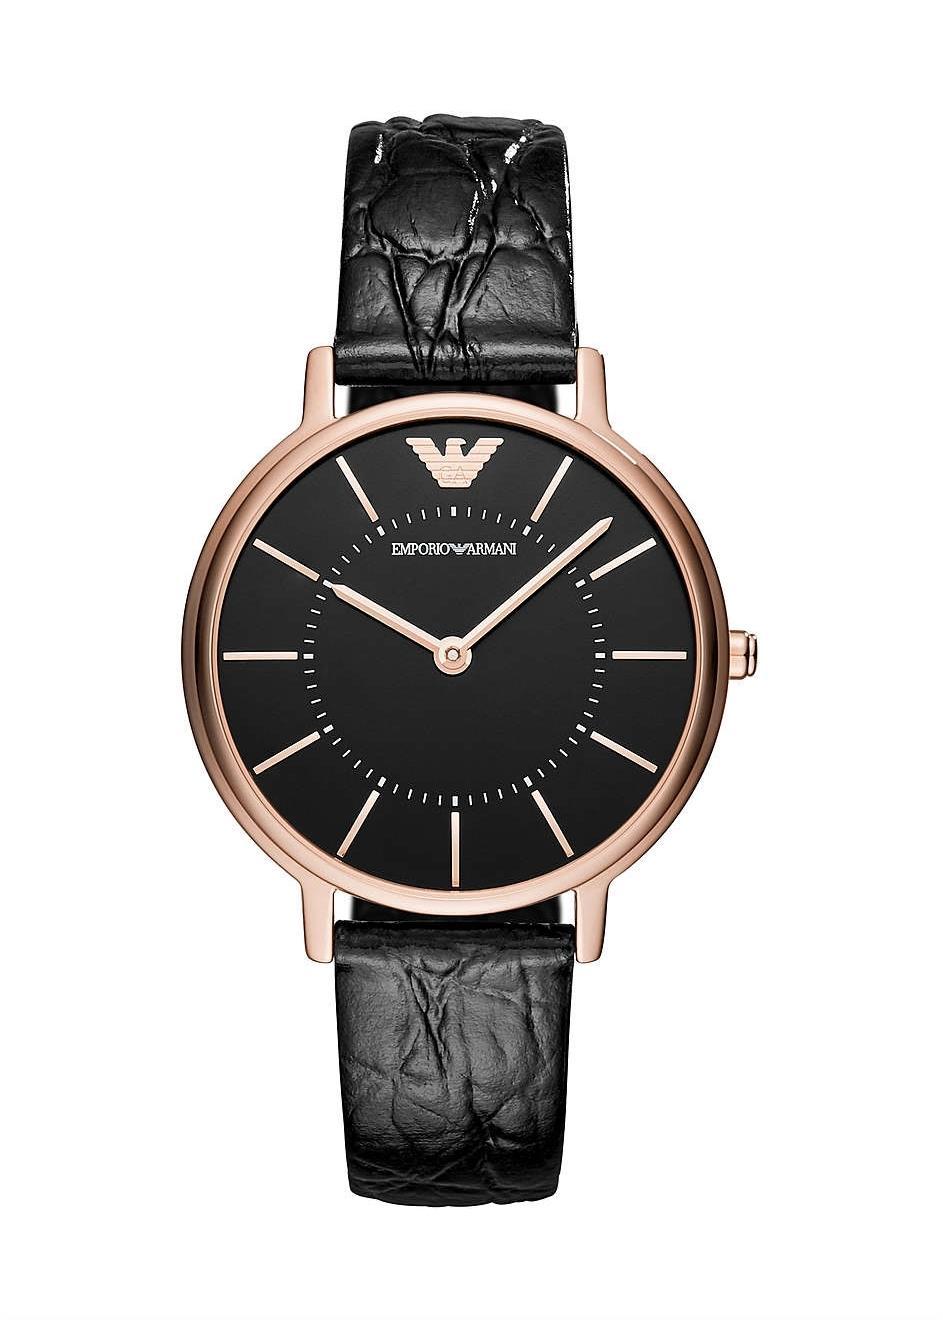 EMPORIO ARMANI Ladies Wrist Watch Model KAPPA AR11064